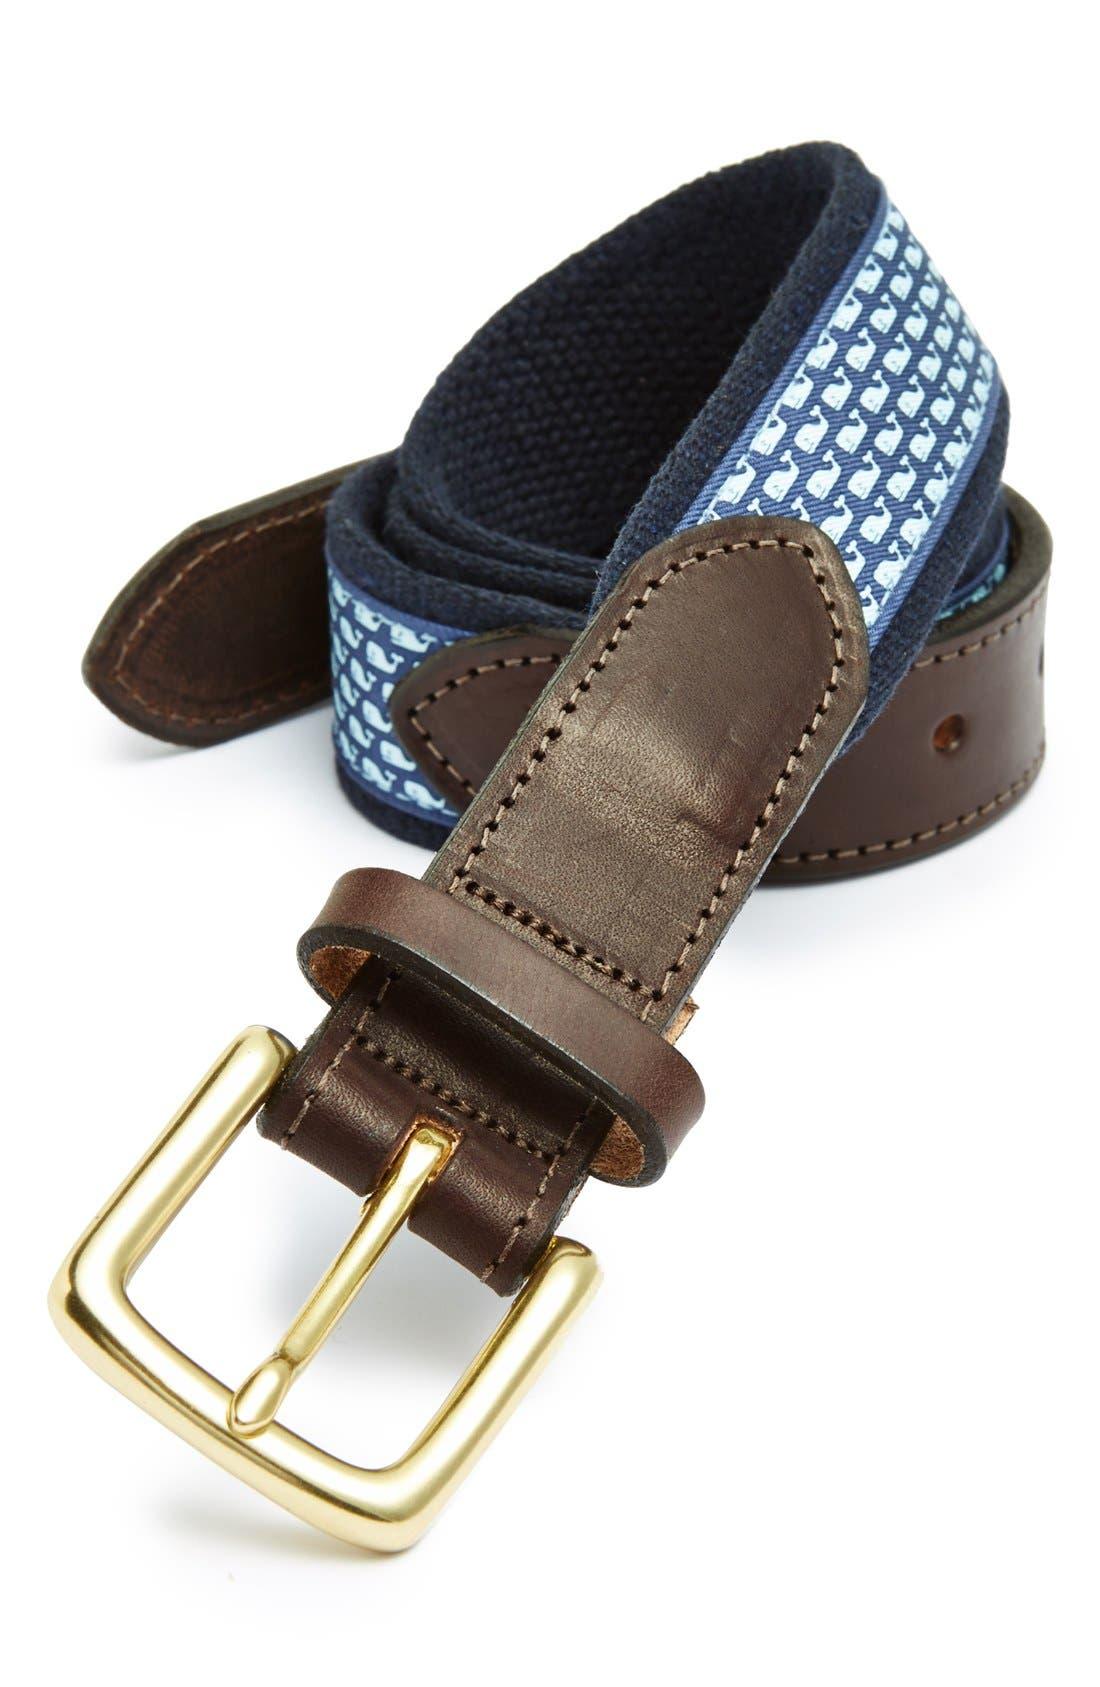 Whale Club Leather & Canvas Belt,                         Main,                         color, NAVY